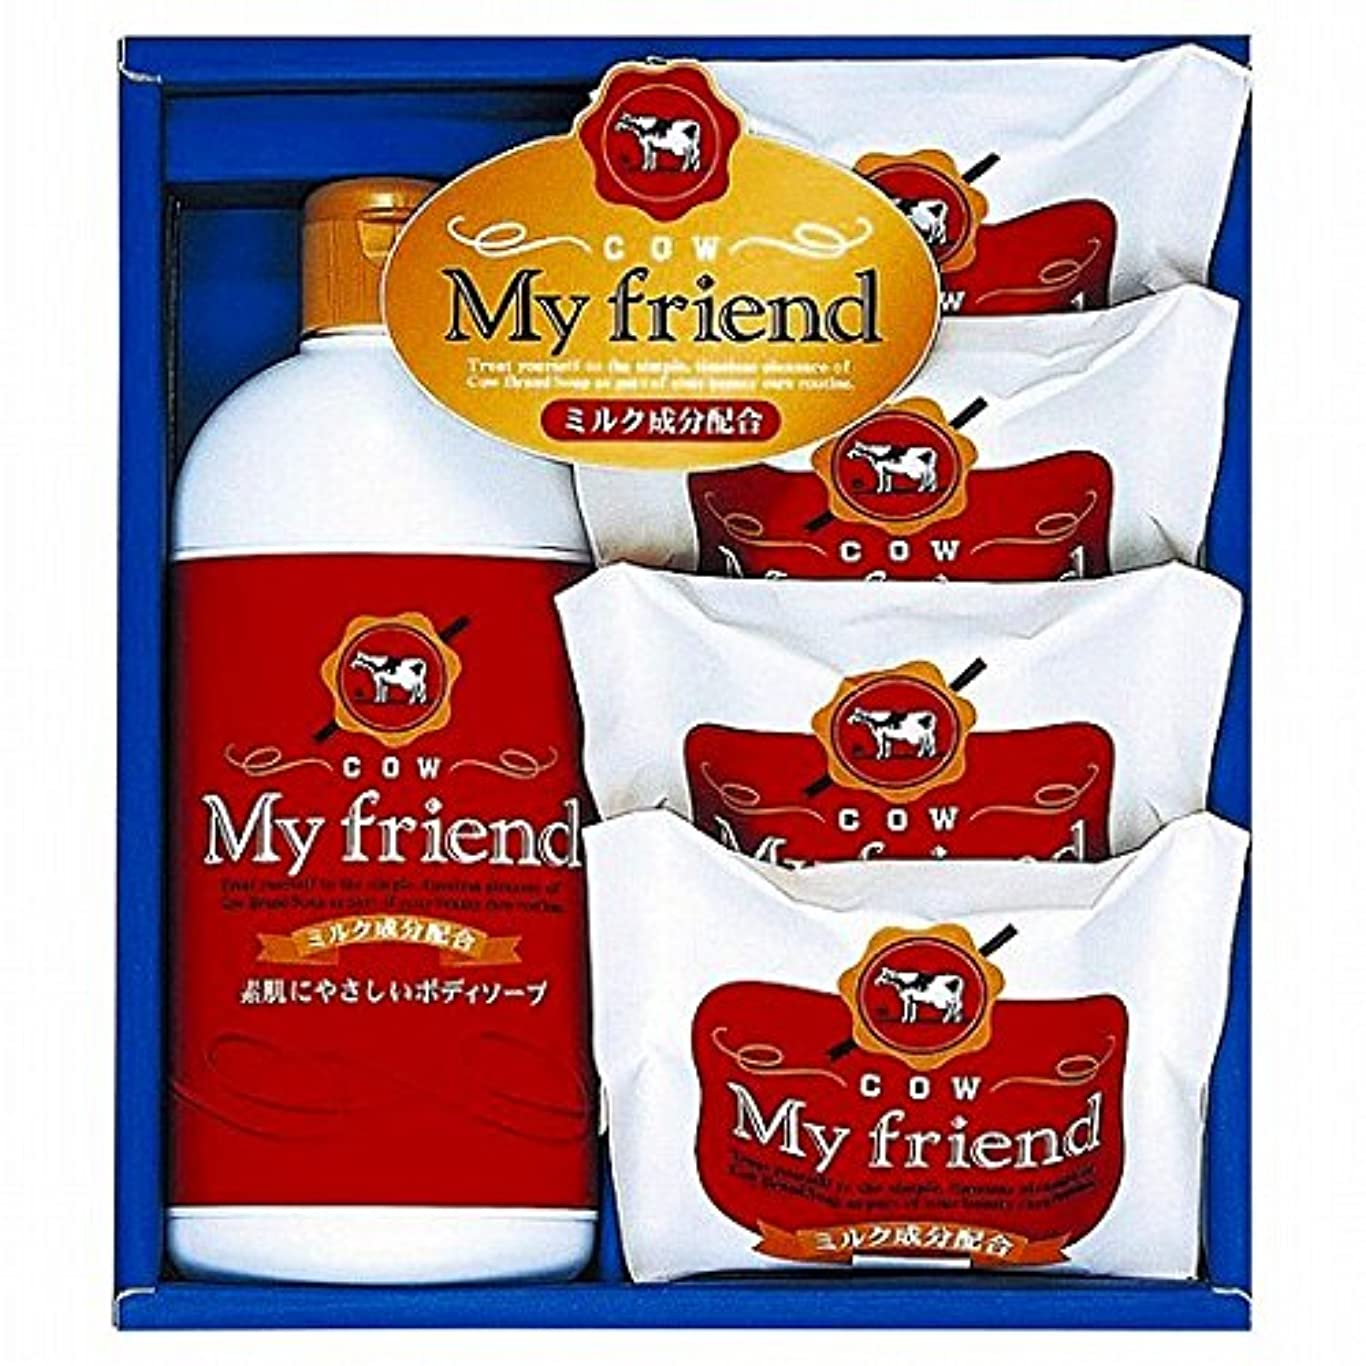 nobrand 牛乳石鹸 マイフレンドボディソープセット (21940007)